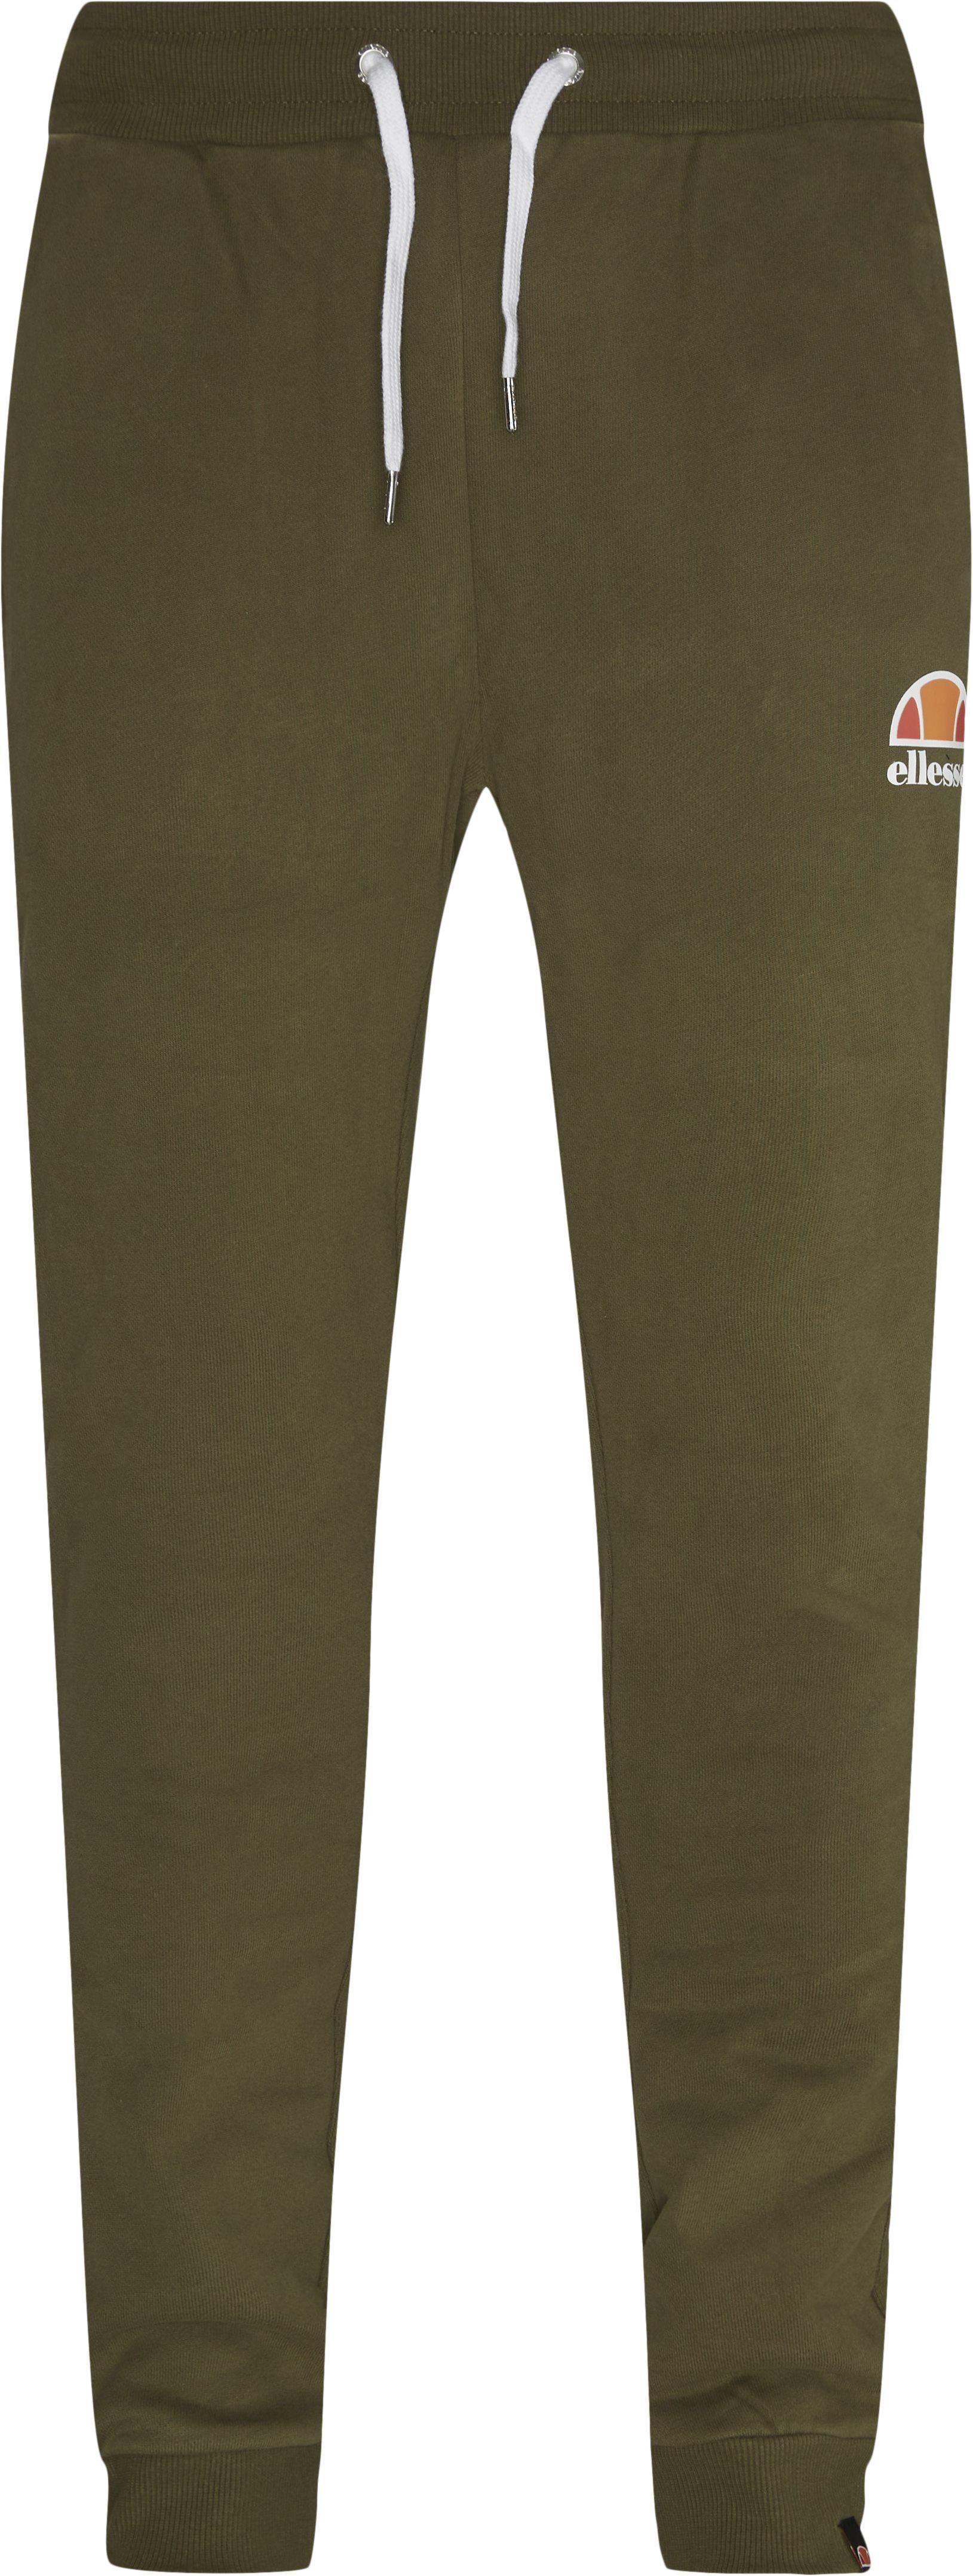 Ovest Sweatpants - Bukser - Regular fit - Army